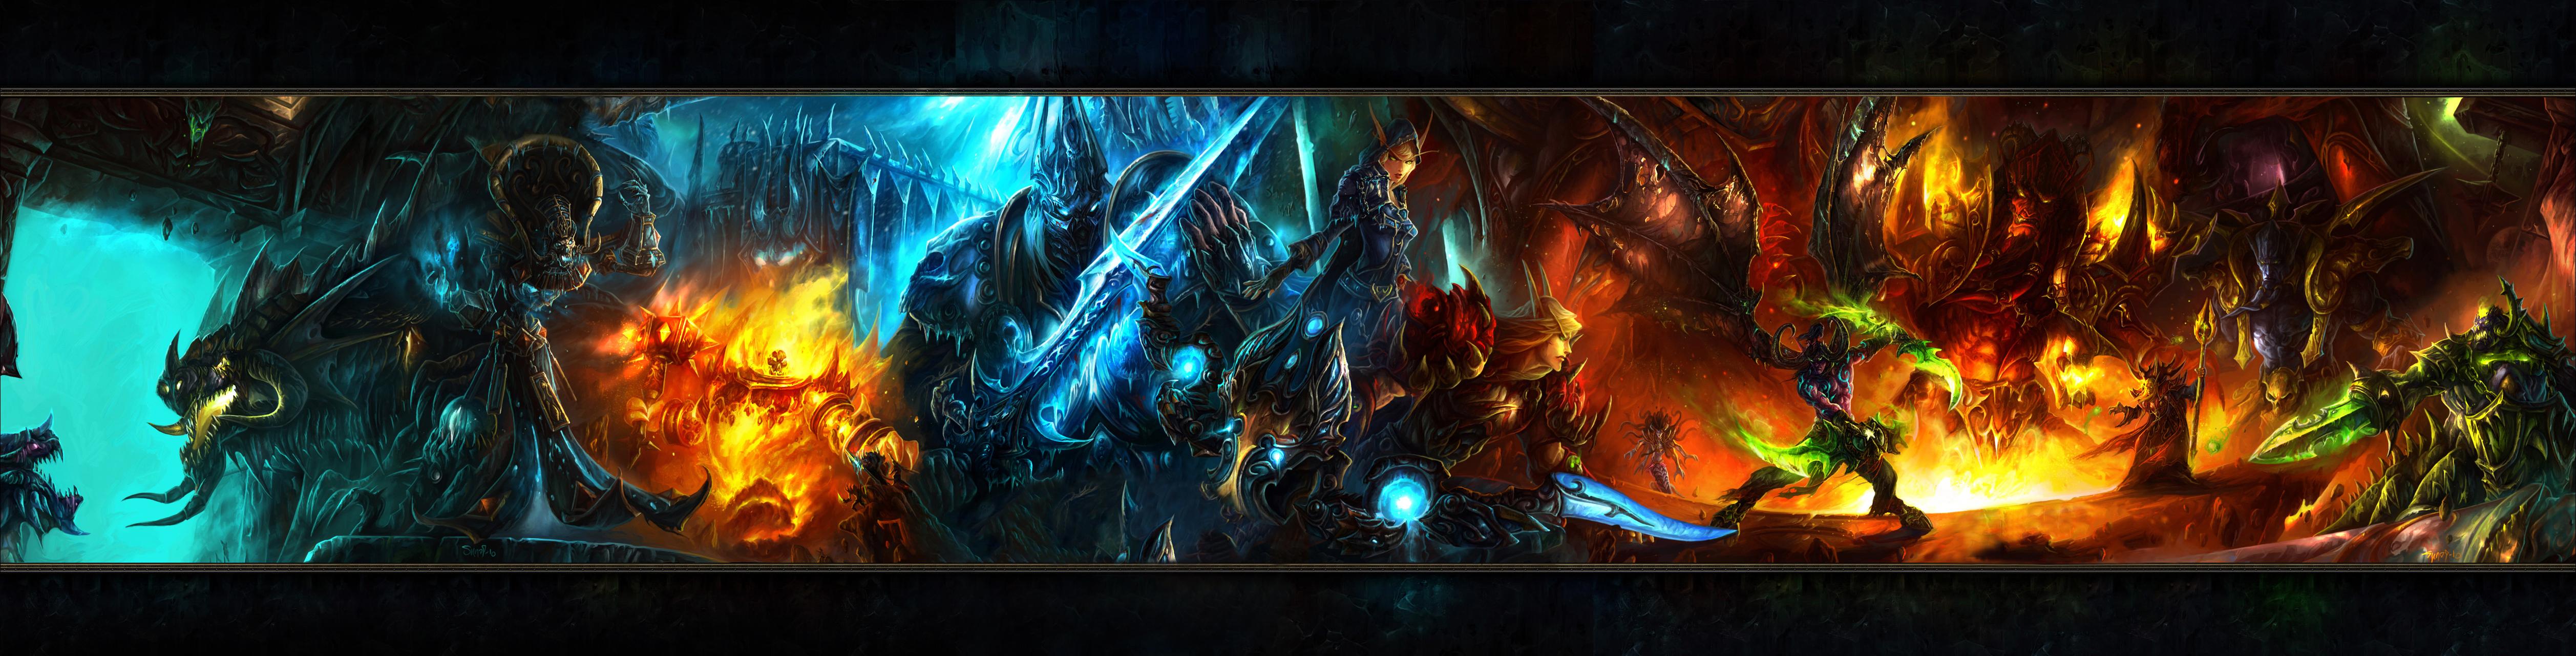 Video Game Computer Wallpapers Desktop Backgrounds 5030x1280